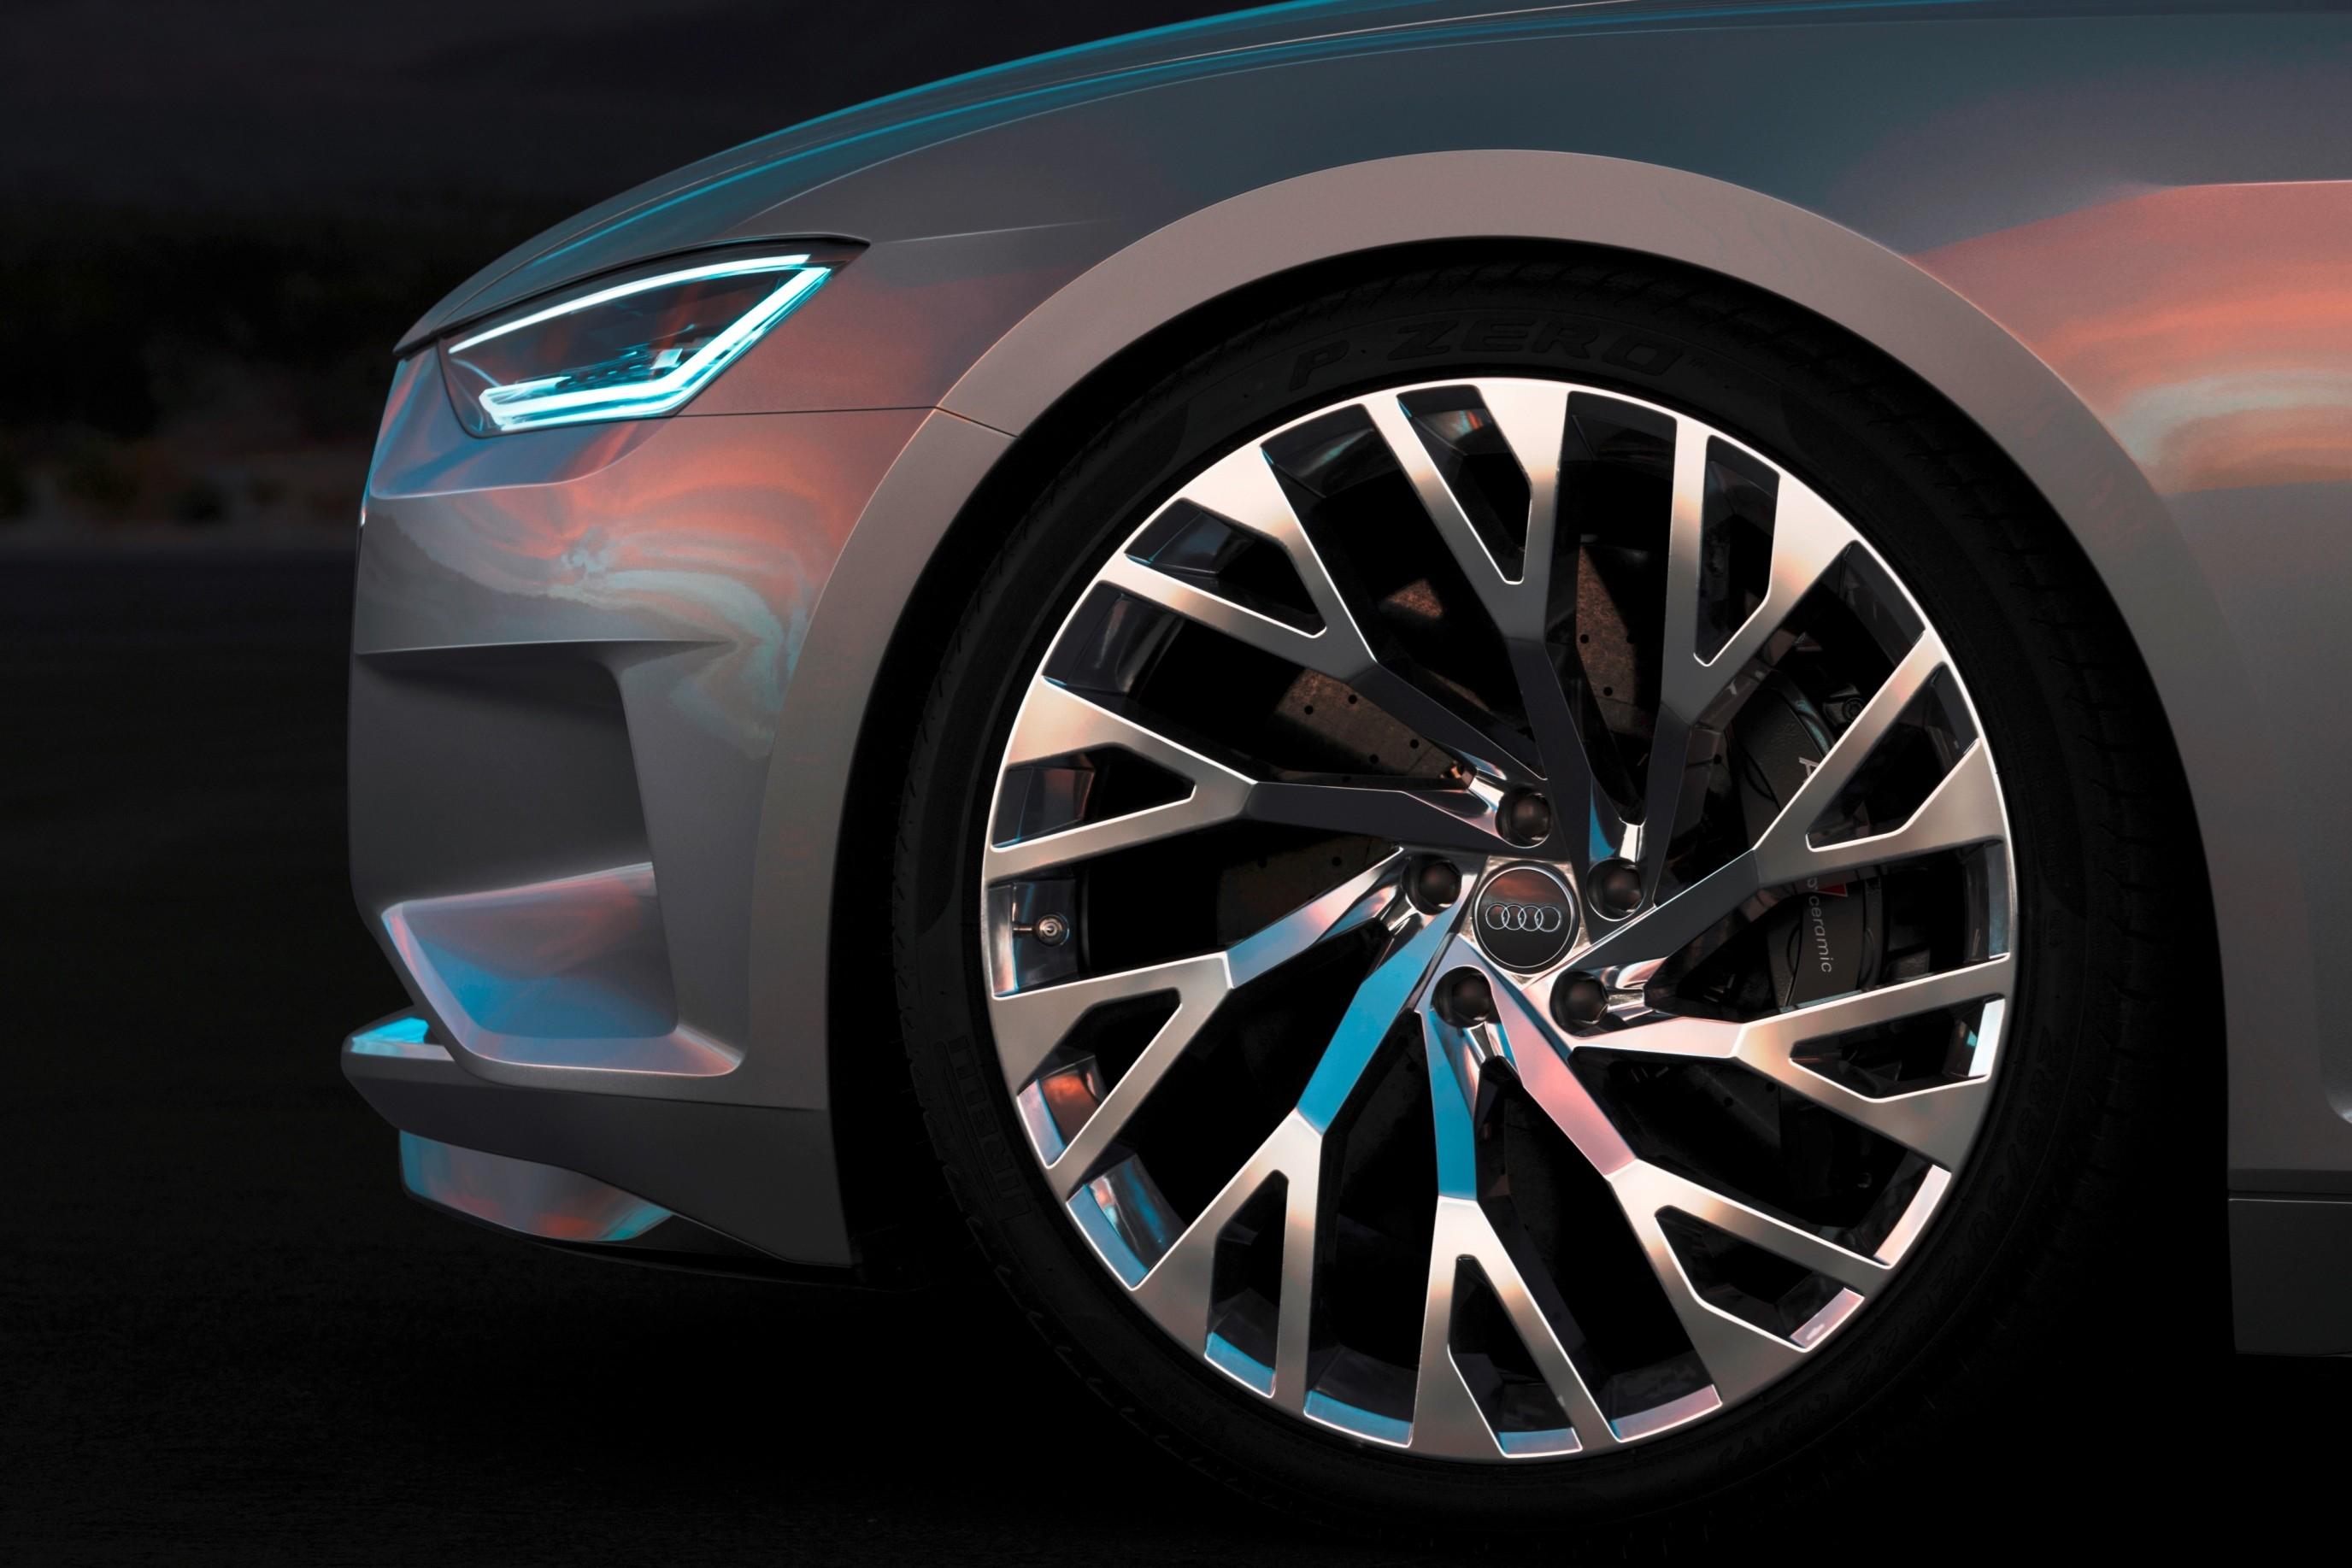 2014 Audi Prologue is Worst of LA 2014 17